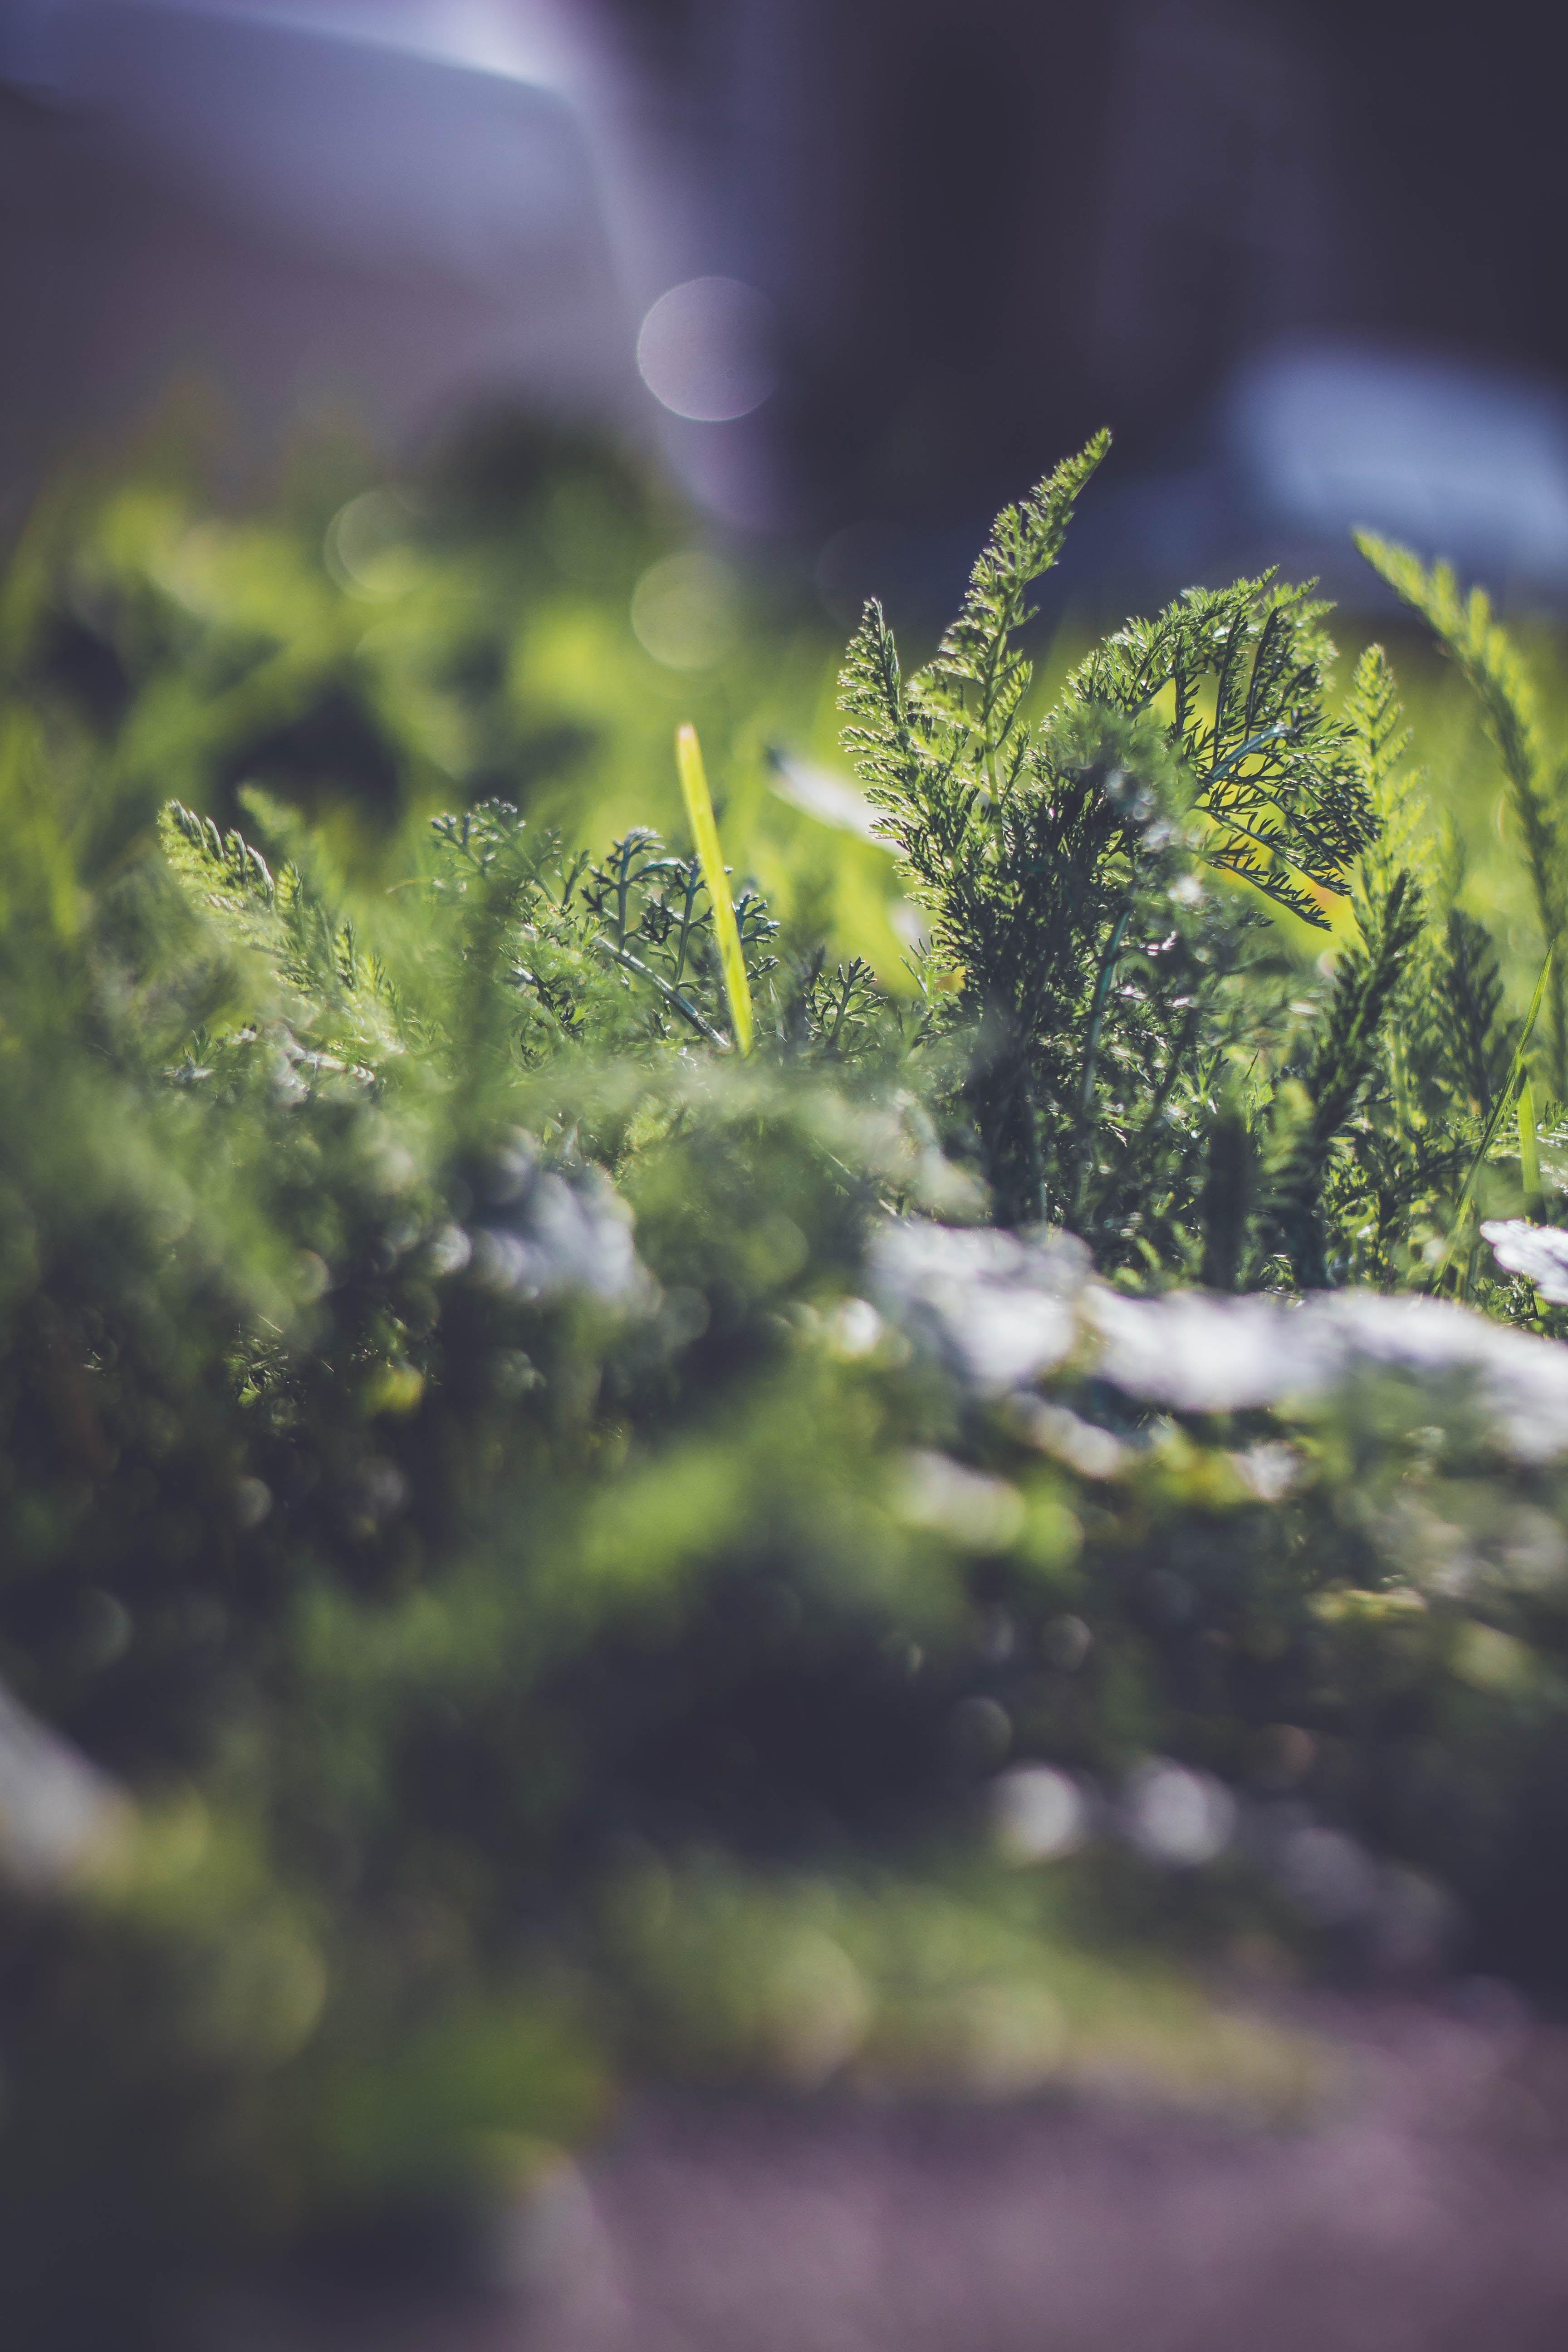 tilt-shift photography of green plants